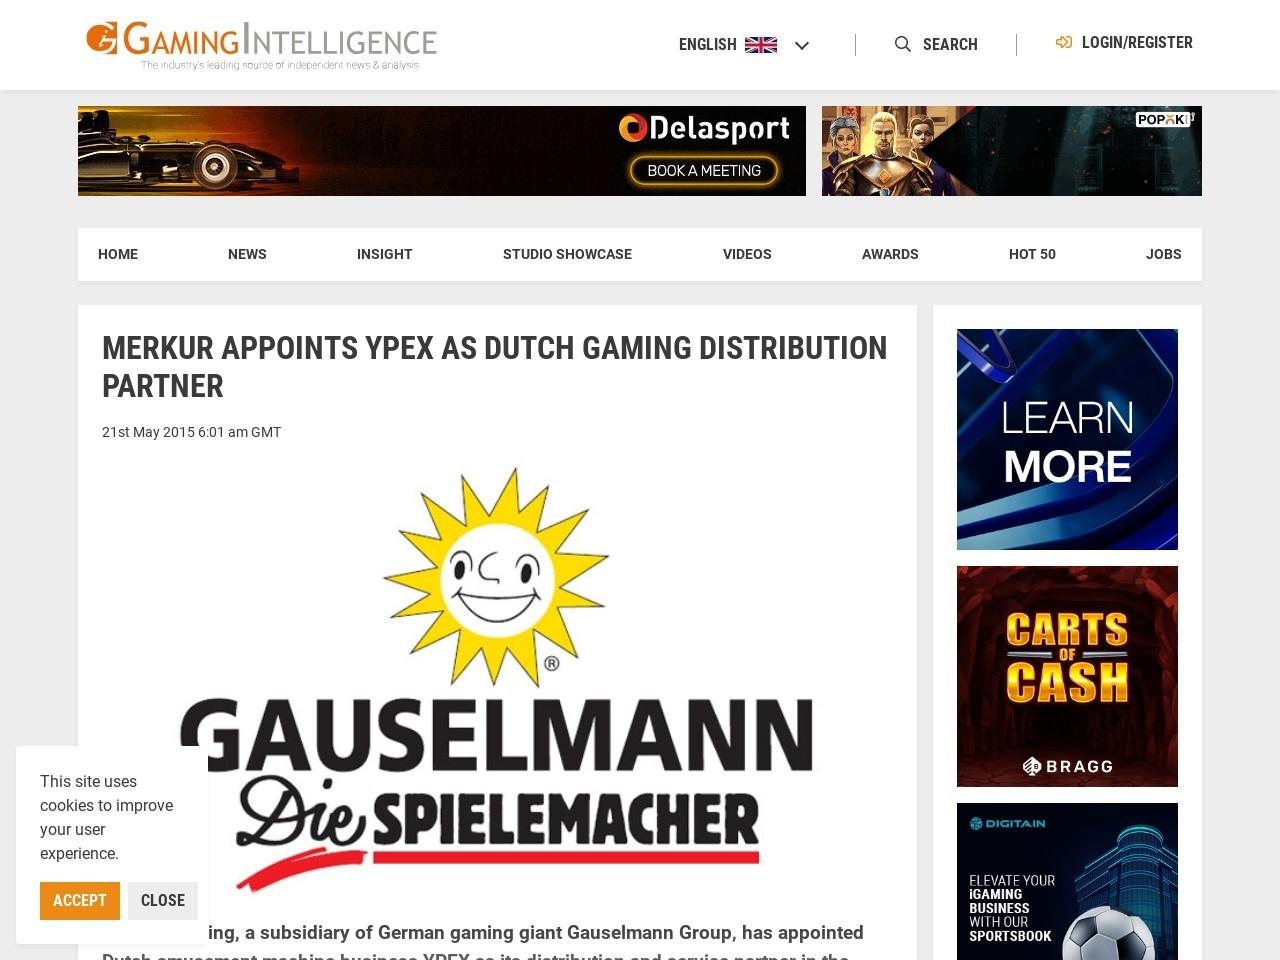 Survey reveals high level of social casino player engagement